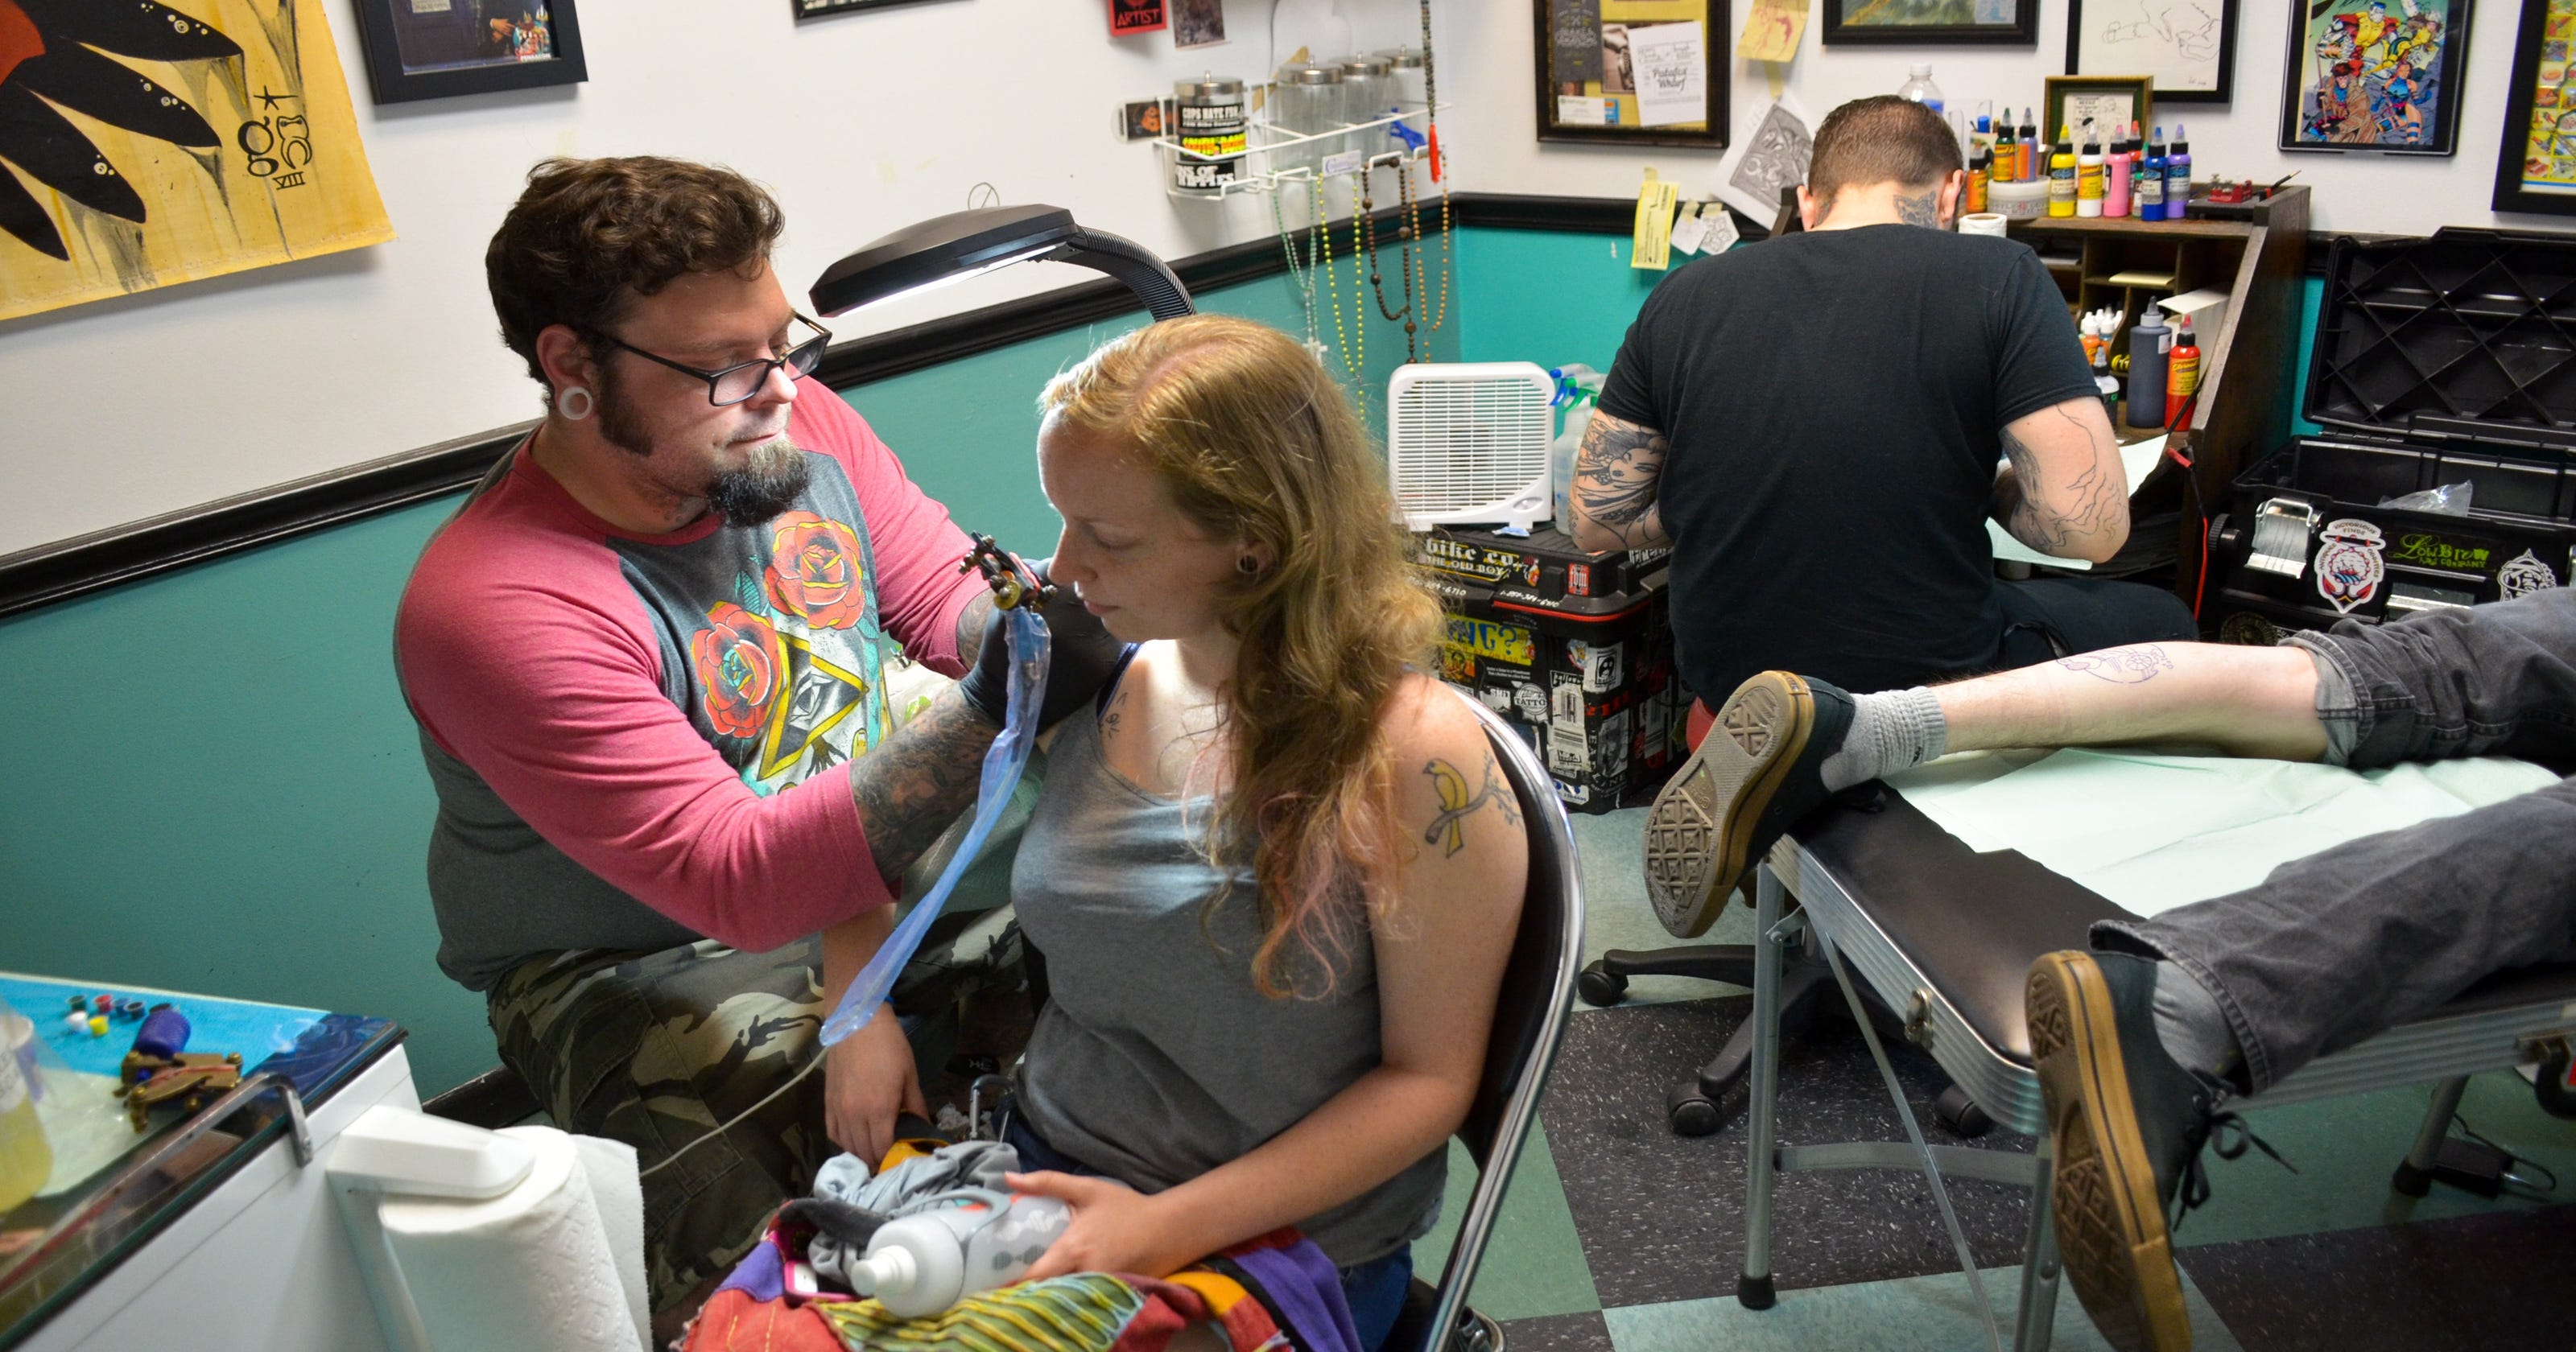 Tattoo parlors coming, food trucks in limbo